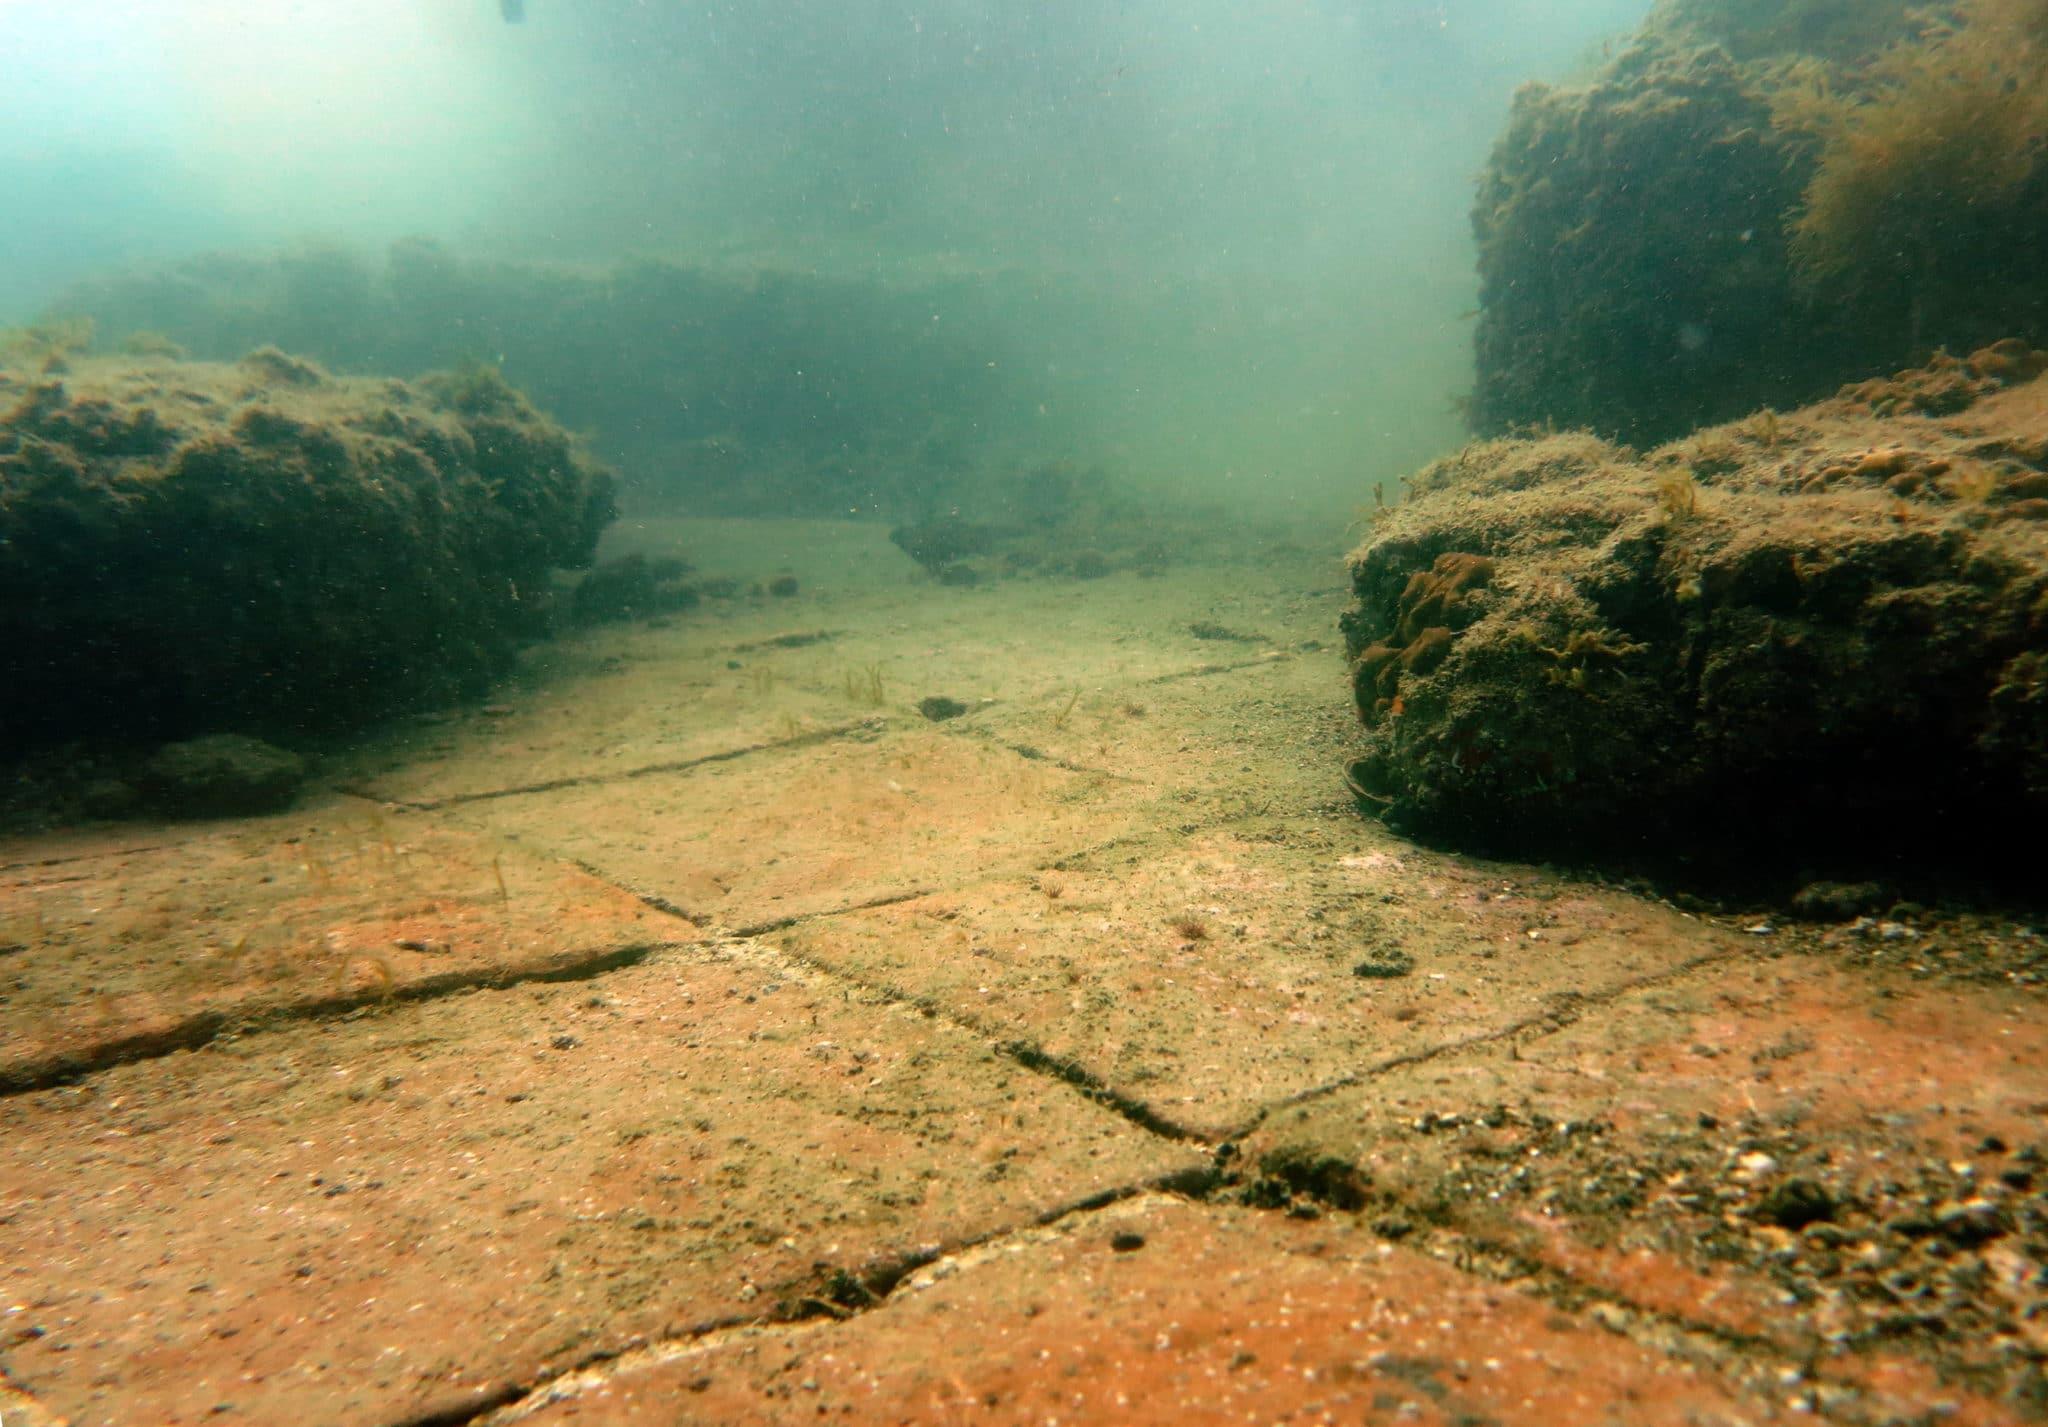 ninfeo claudio - scuba diving underwater archeological park Baia - plongée cité engloutie Baia